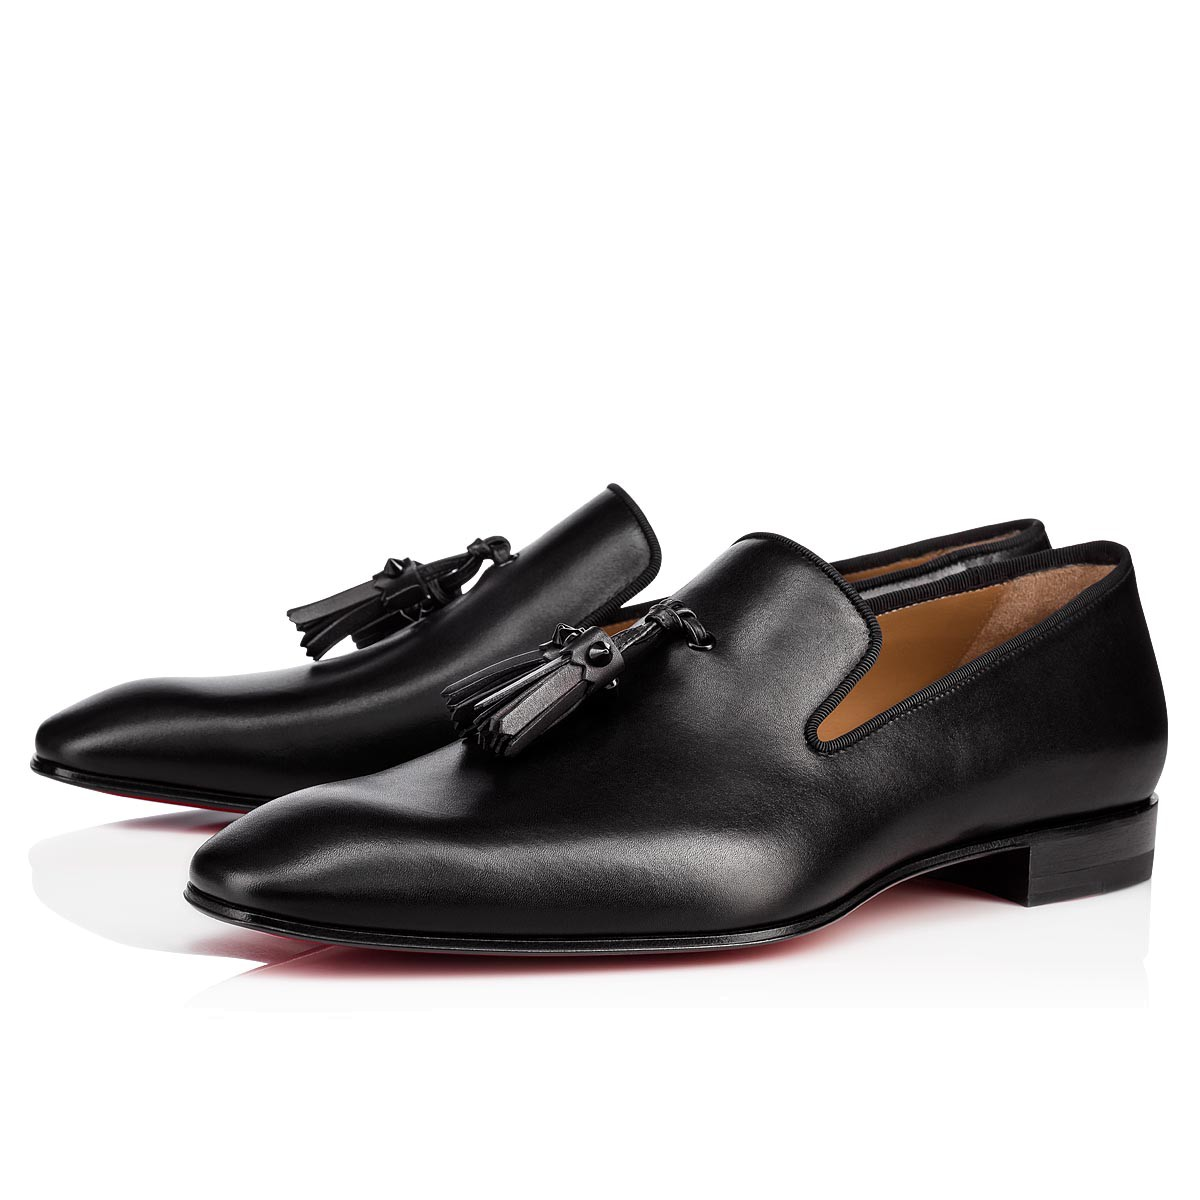 Men Shoes - Dandelion Tassel Flat - Christian Louboutin